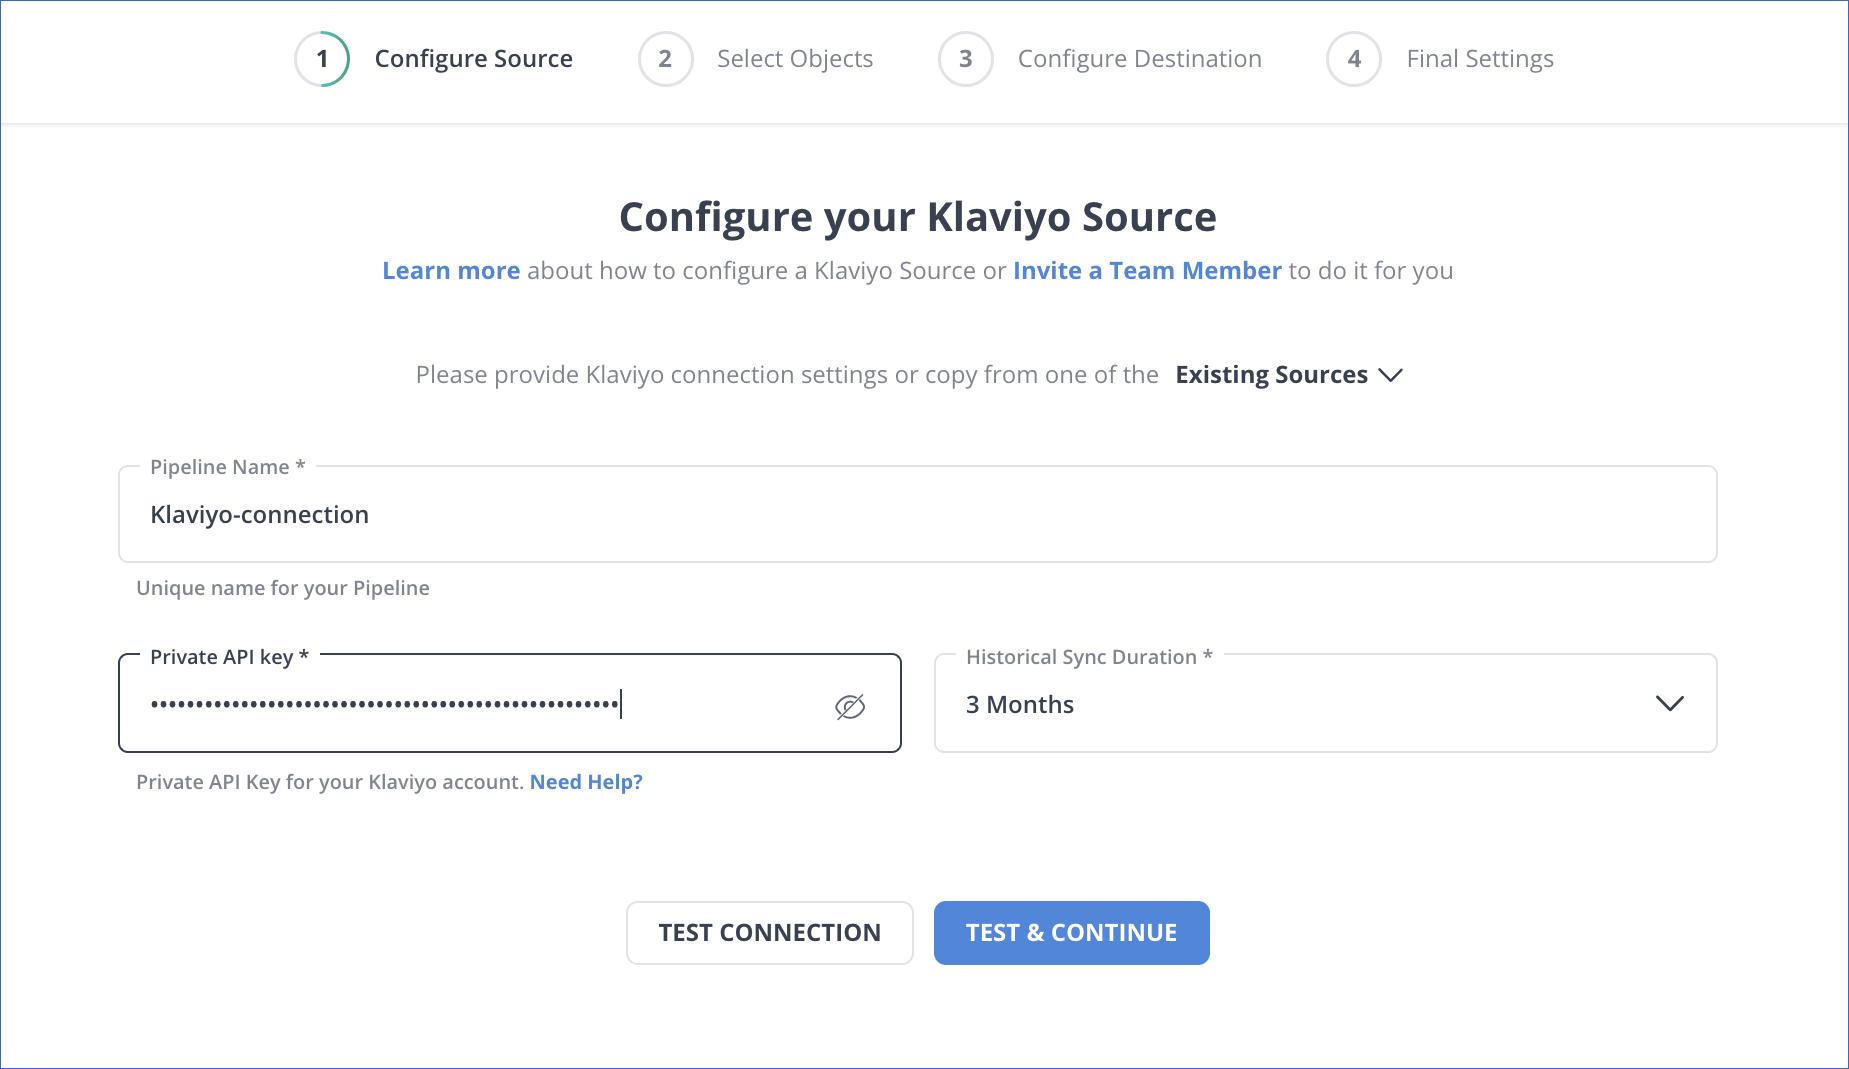 Source settings